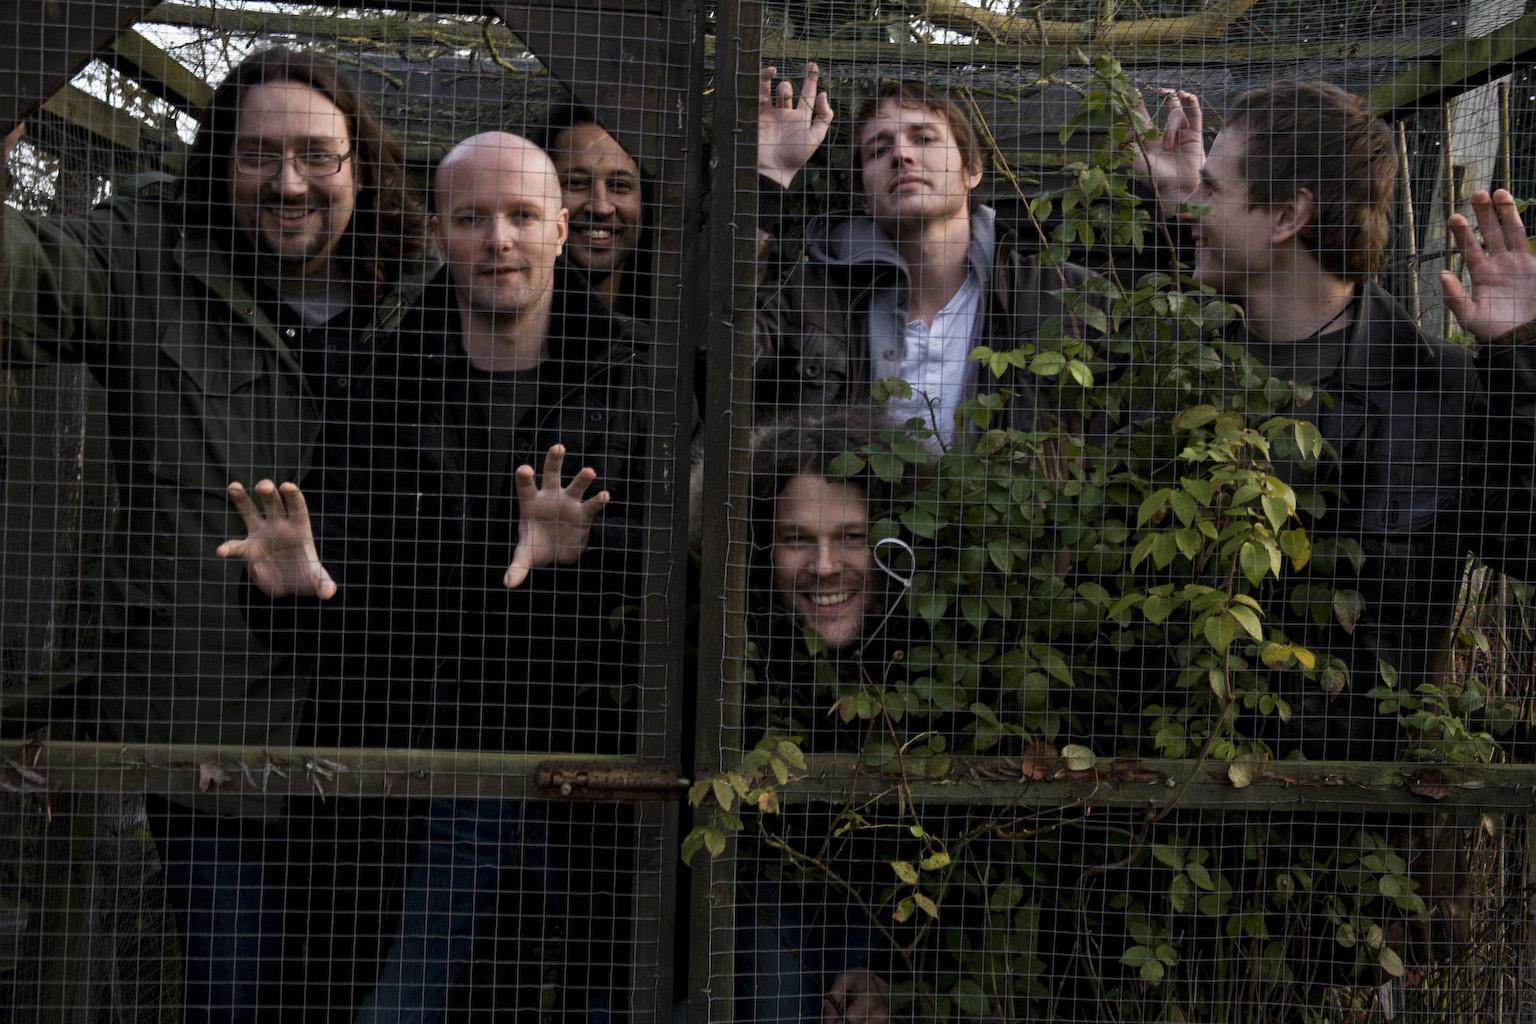 Adam Drake, Pat Illingworth, Richard Bundy,Alex Meadows, Tom Peters, Simon Jaymes, Photo by Emma Brown